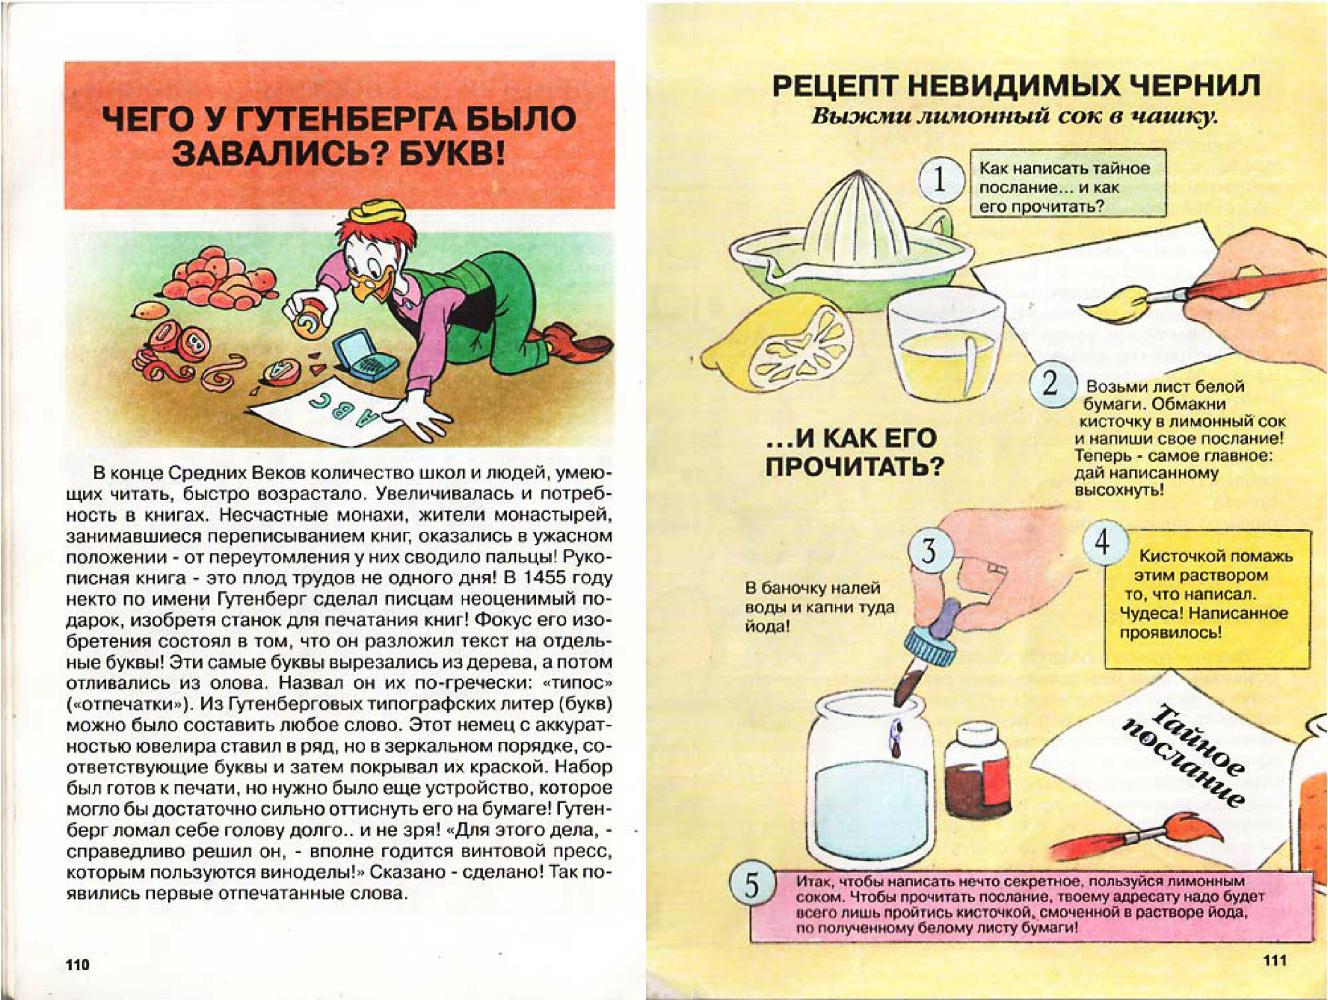 http://i2.imageban.ru/out/2013/12/06/973a455e15fa7f30e6c4792a0074e9d3.jpg